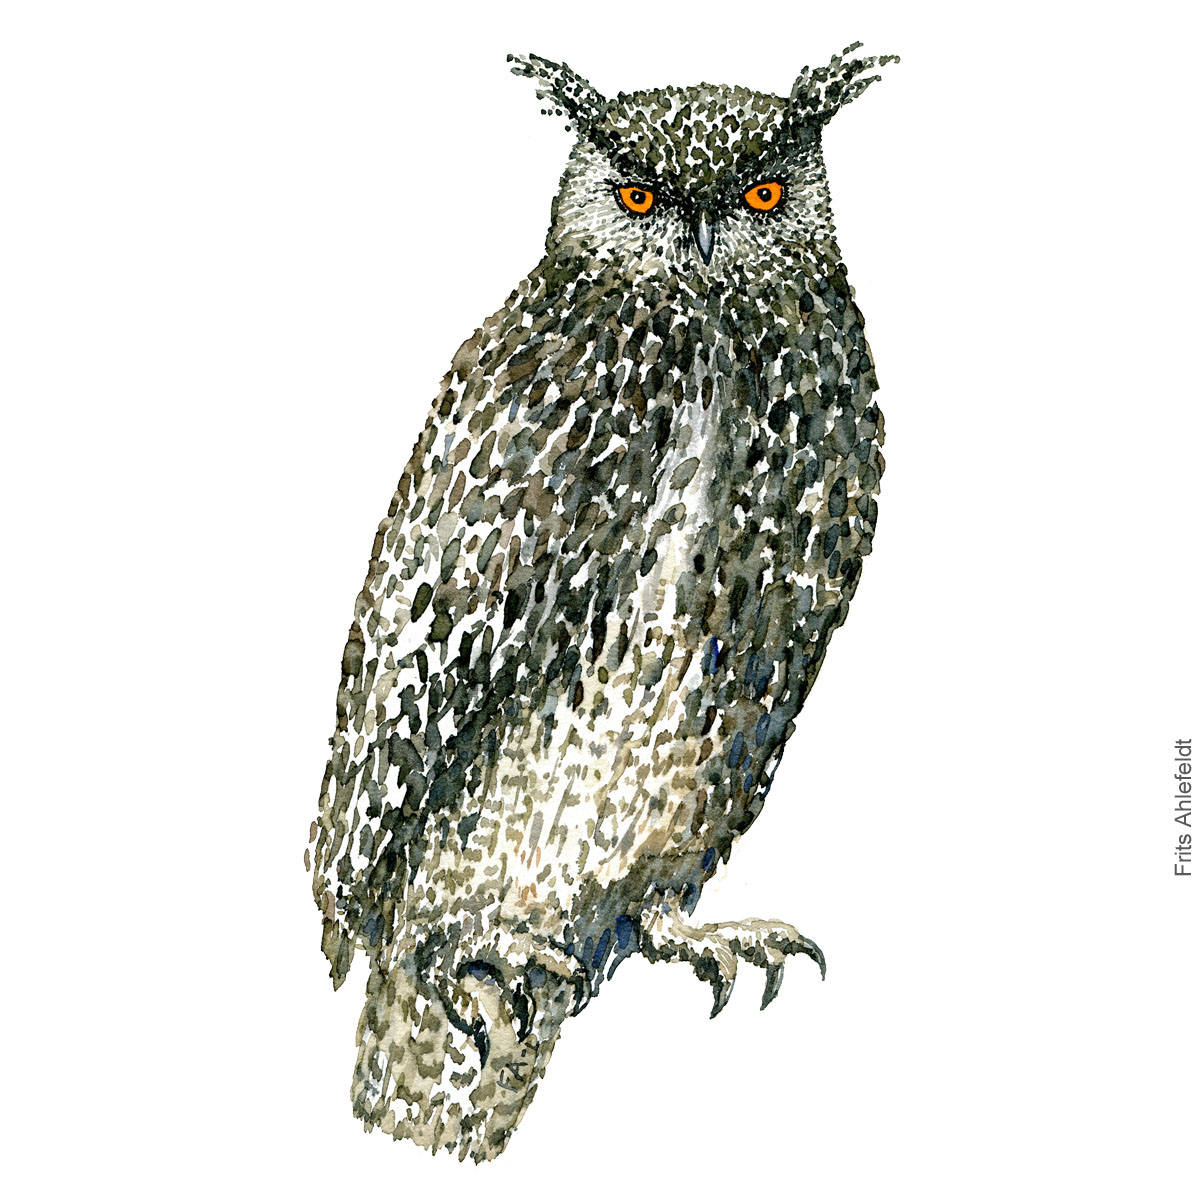 Stor hornugle - Eurasian eagle owl. - Bird watercolor painting. Artwork by Frits Ahlefeldt. Fugle akvarel